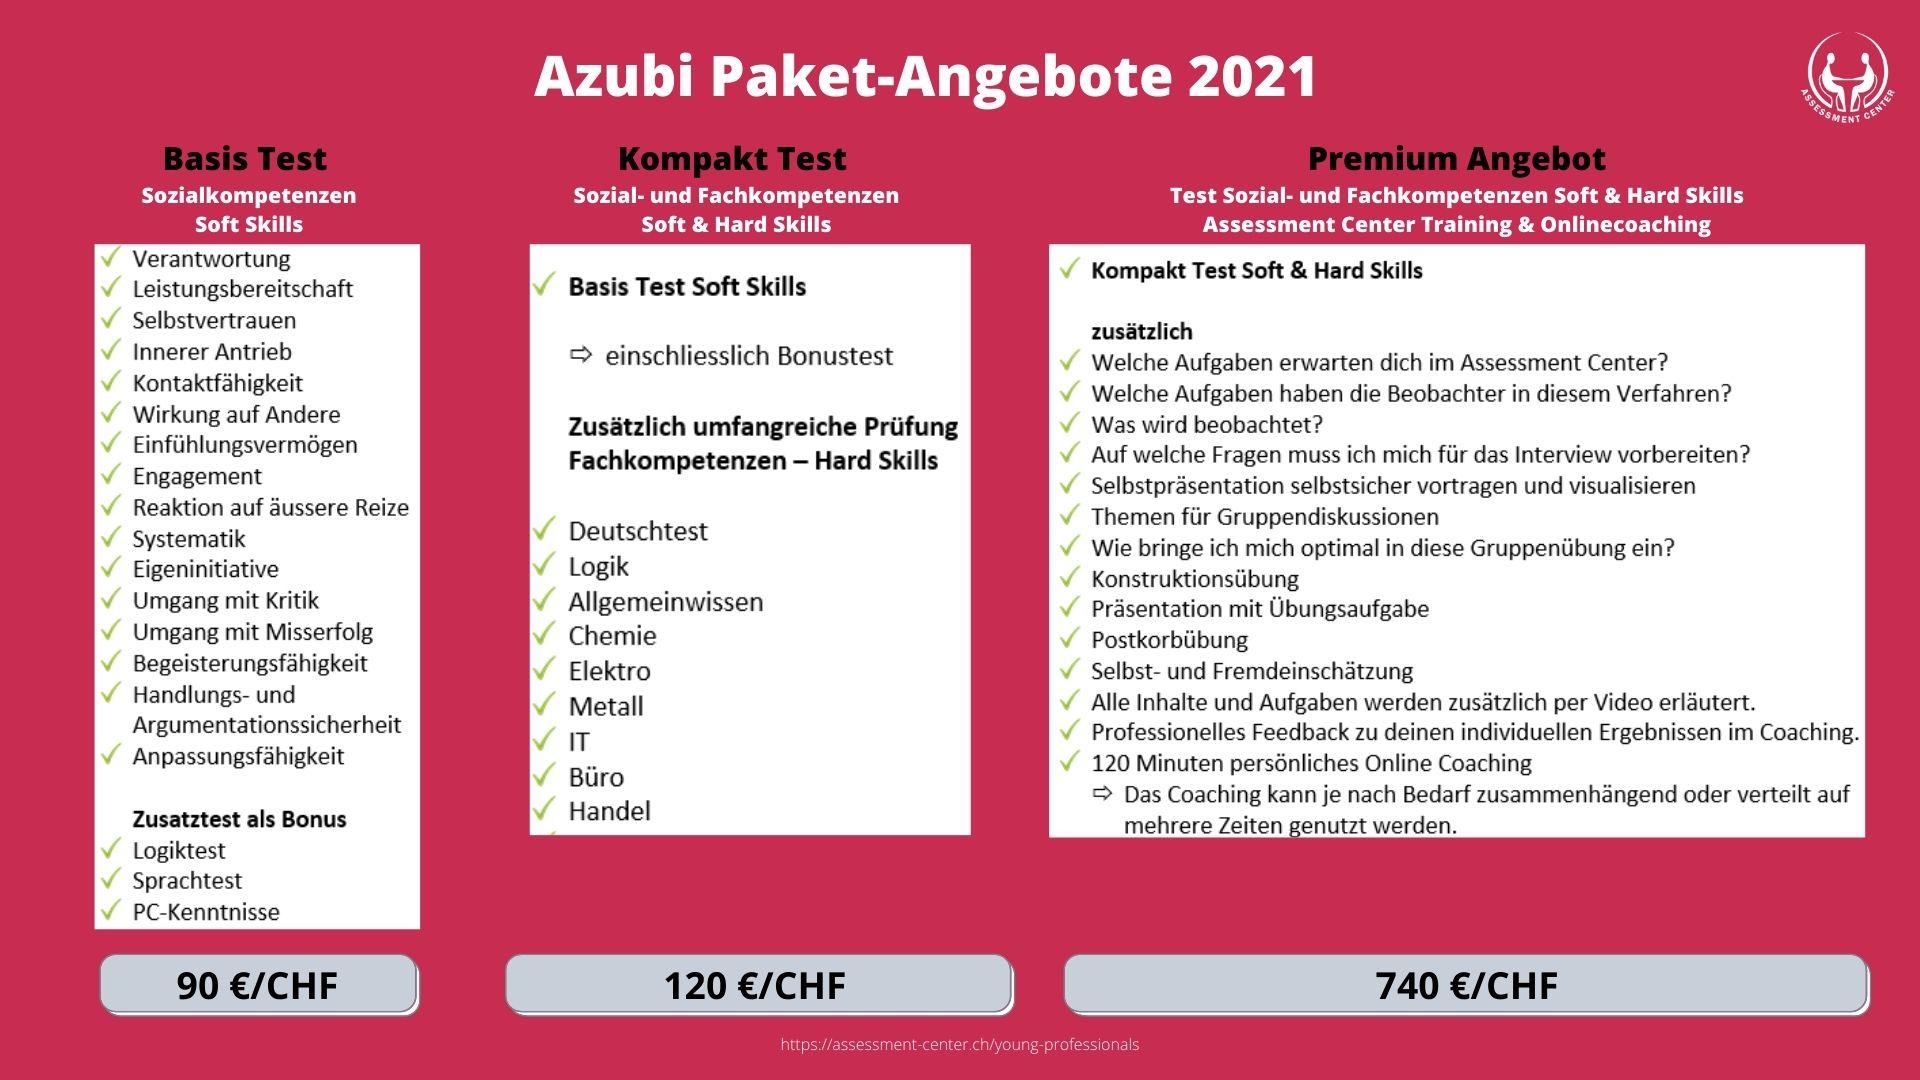 Azubi Paket-Angebote 2021